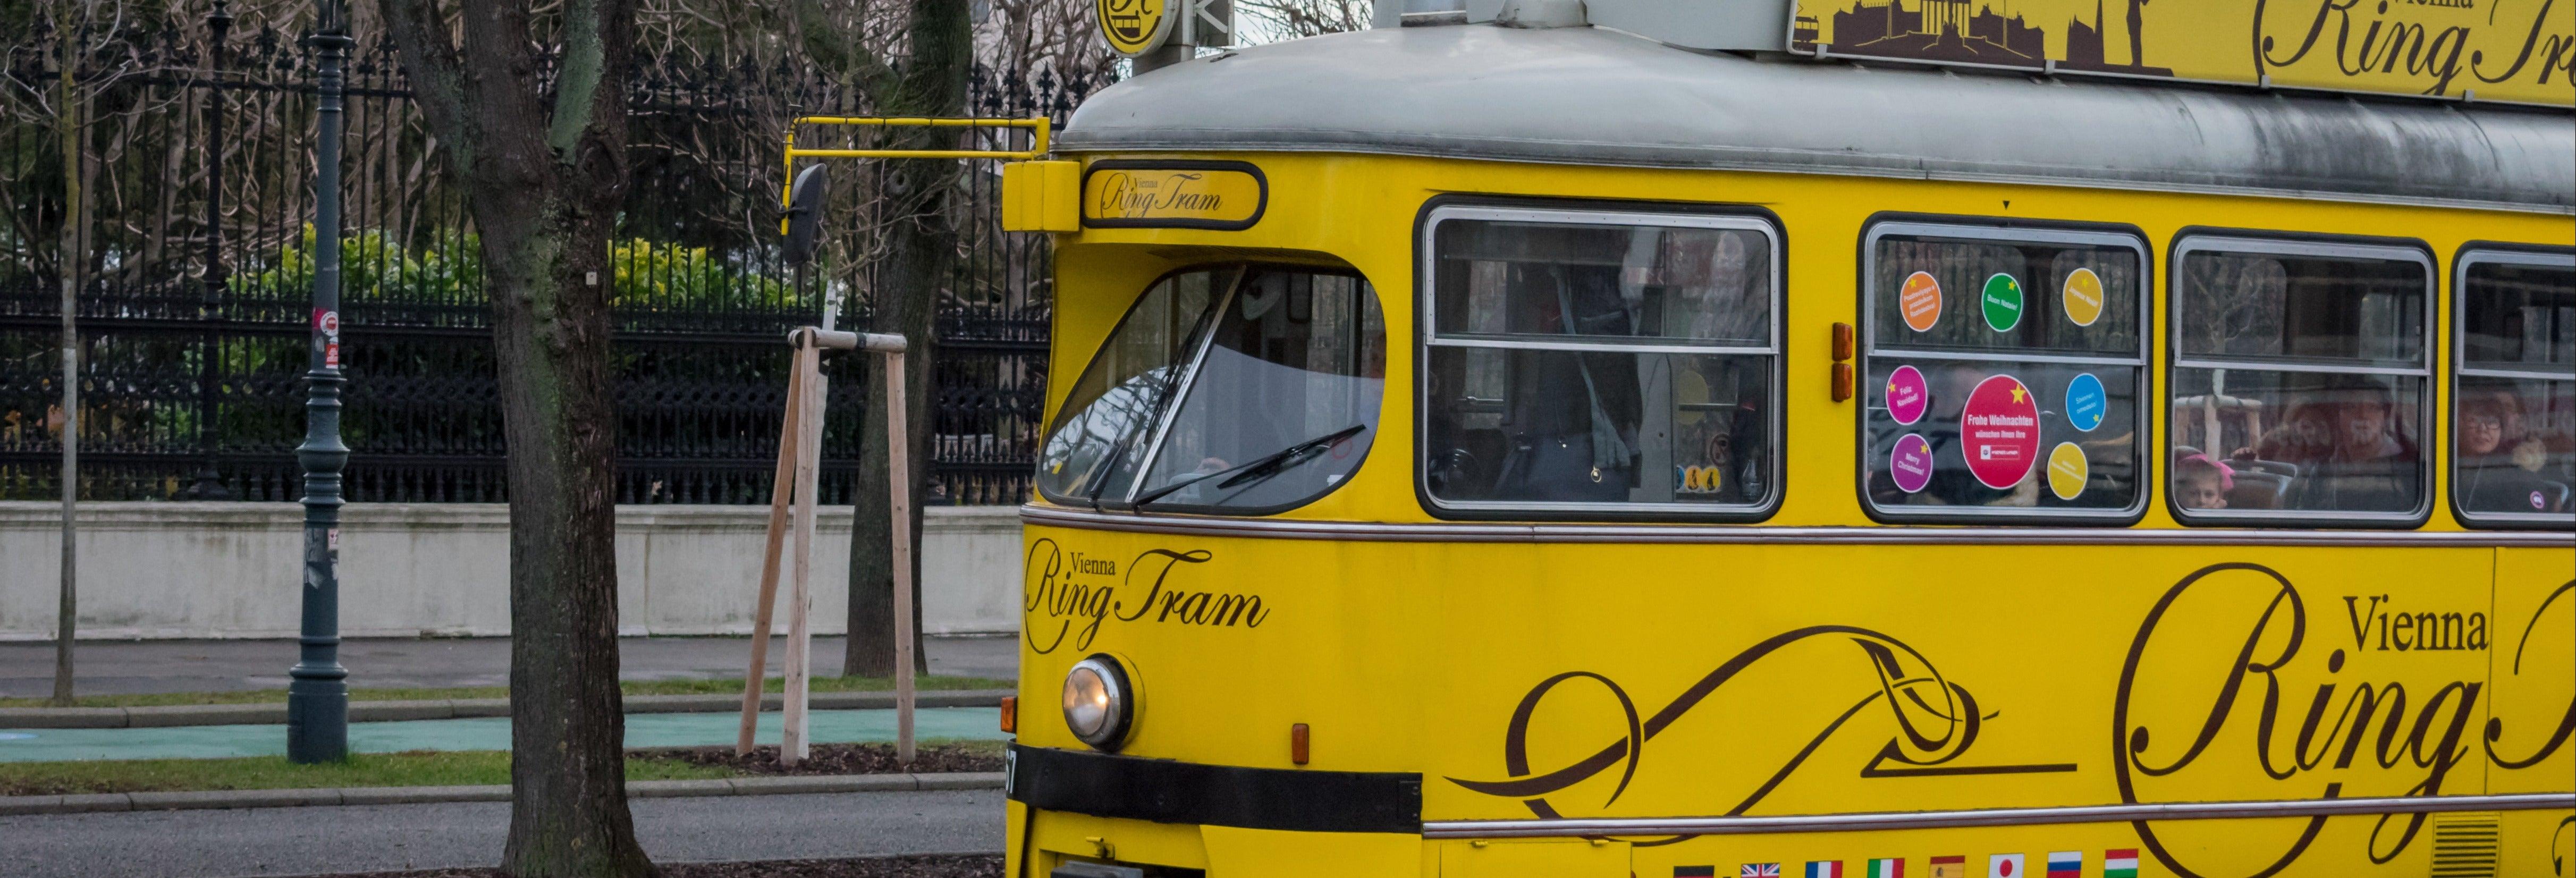 Tram turistico di Vienna